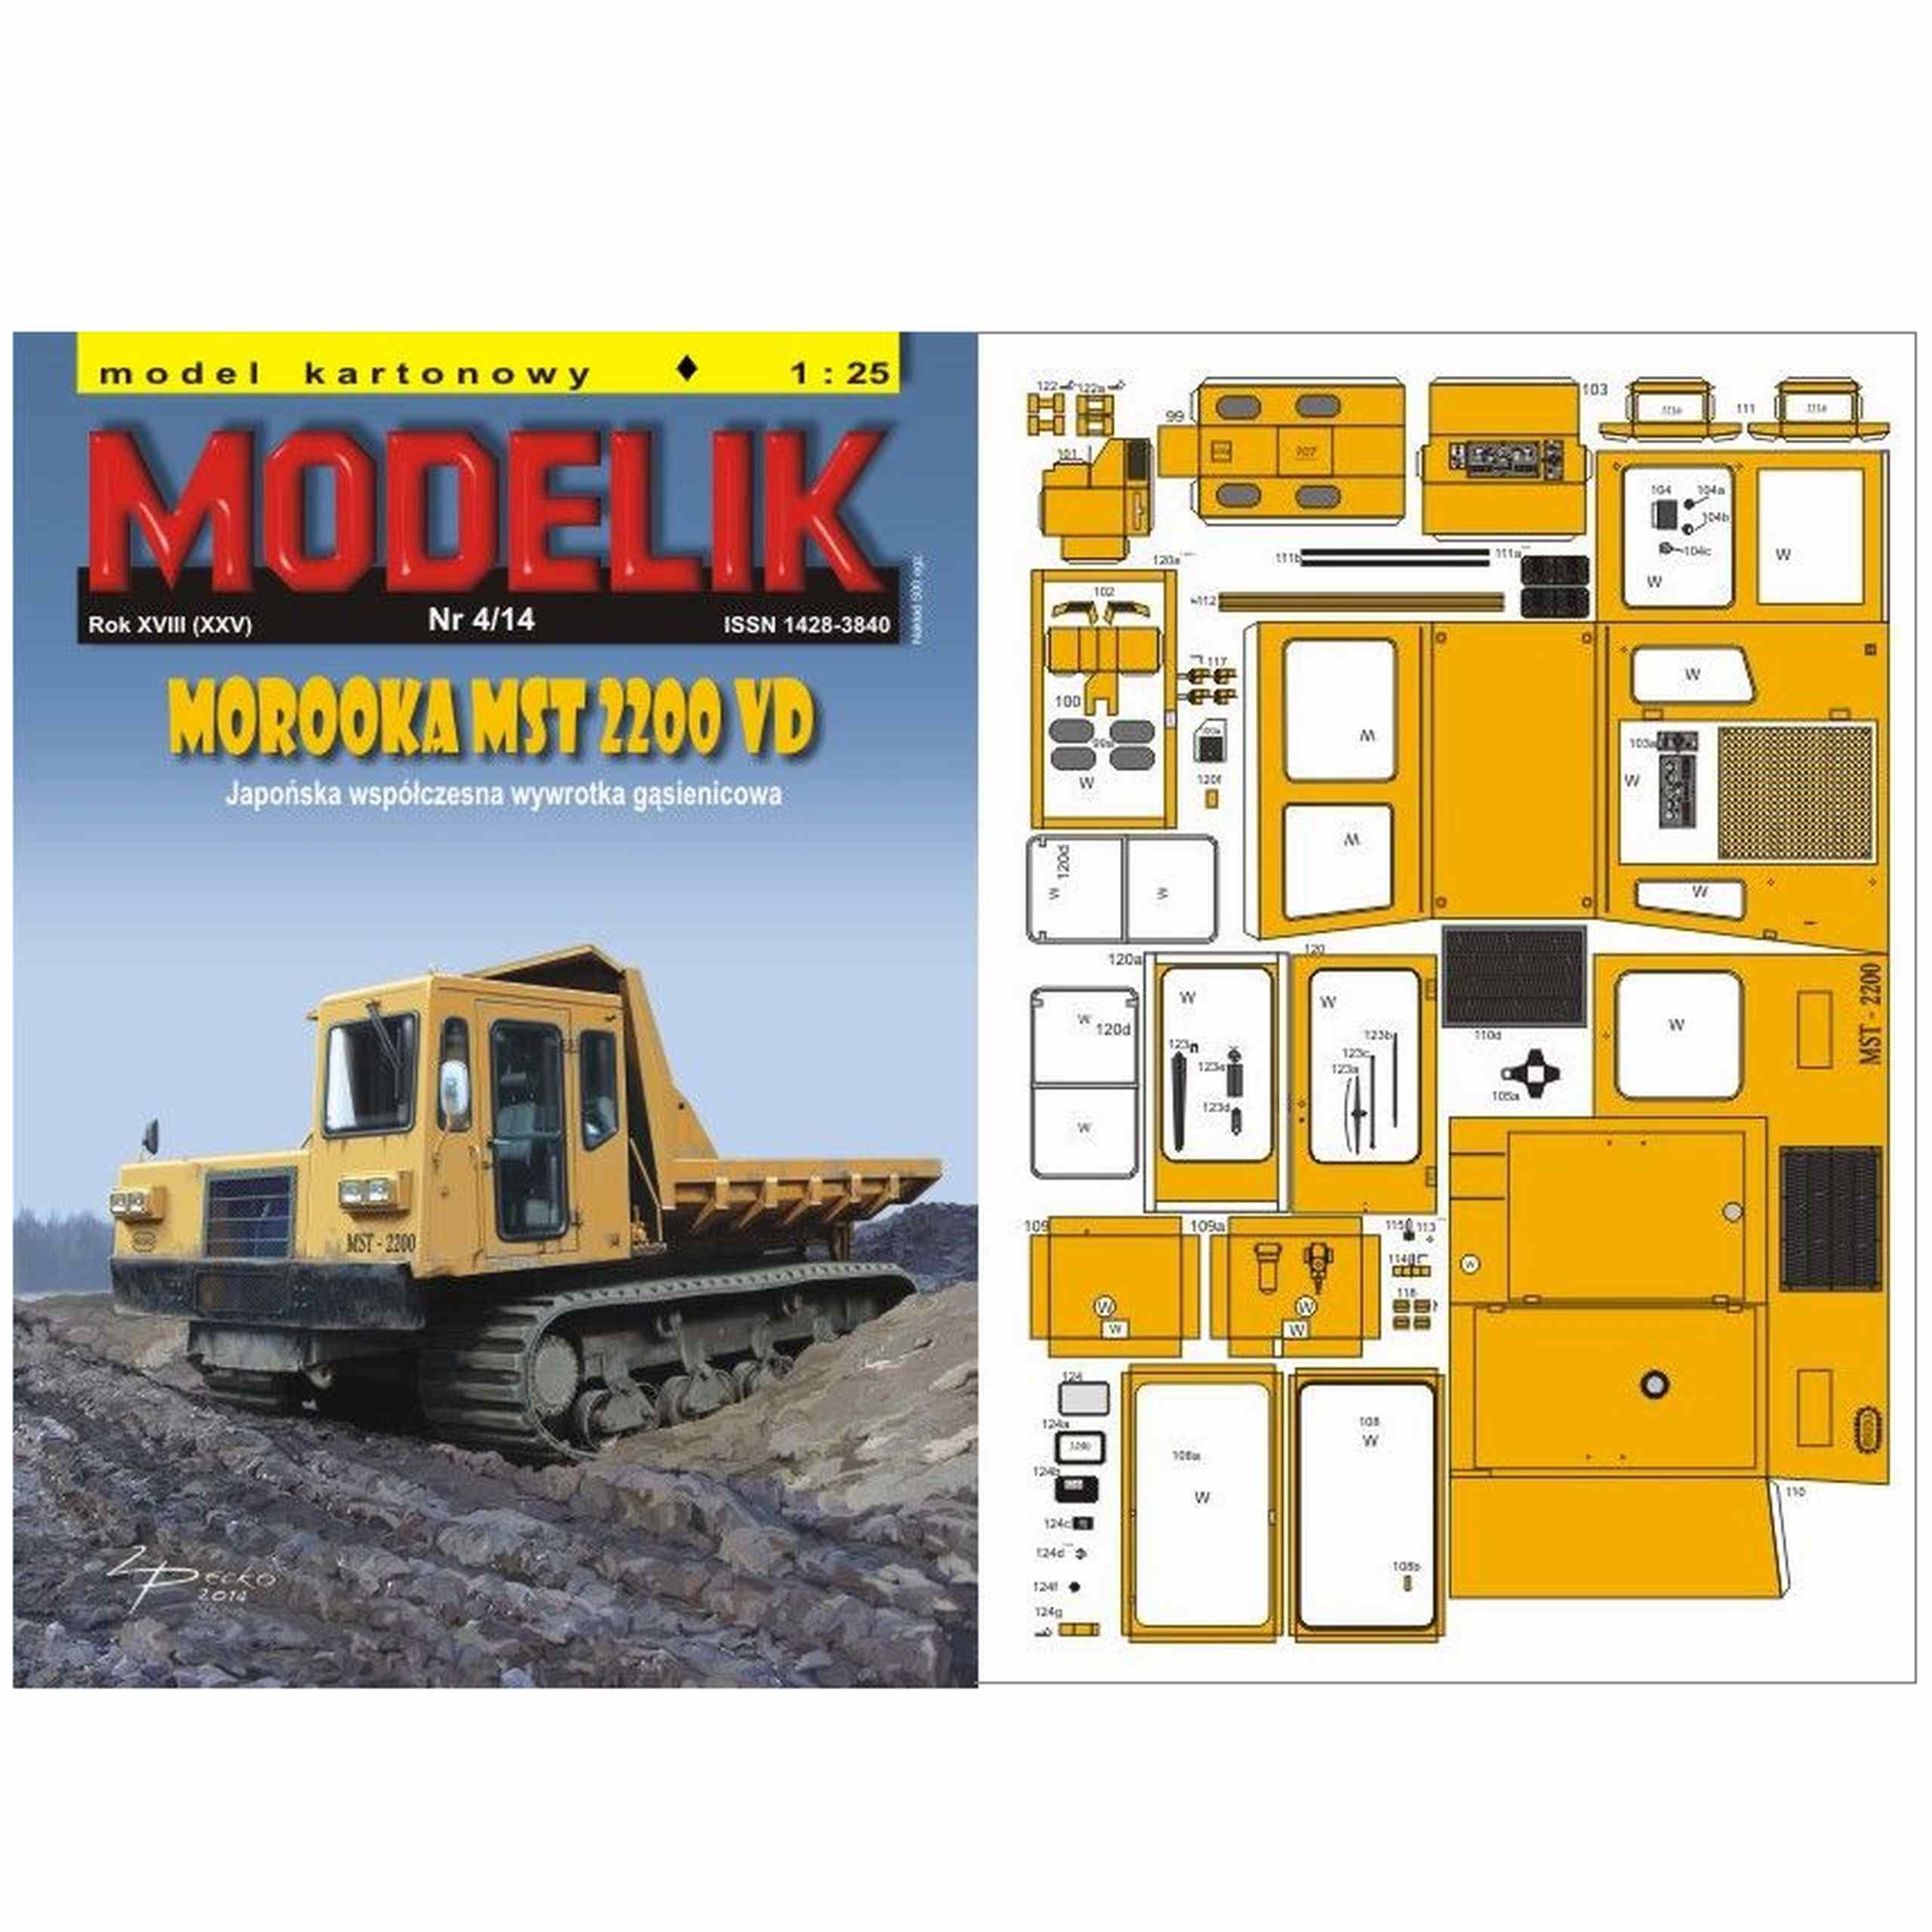 Modelik 4/14 Sklápač MOPOOKA MST 2200 VDP 1:25